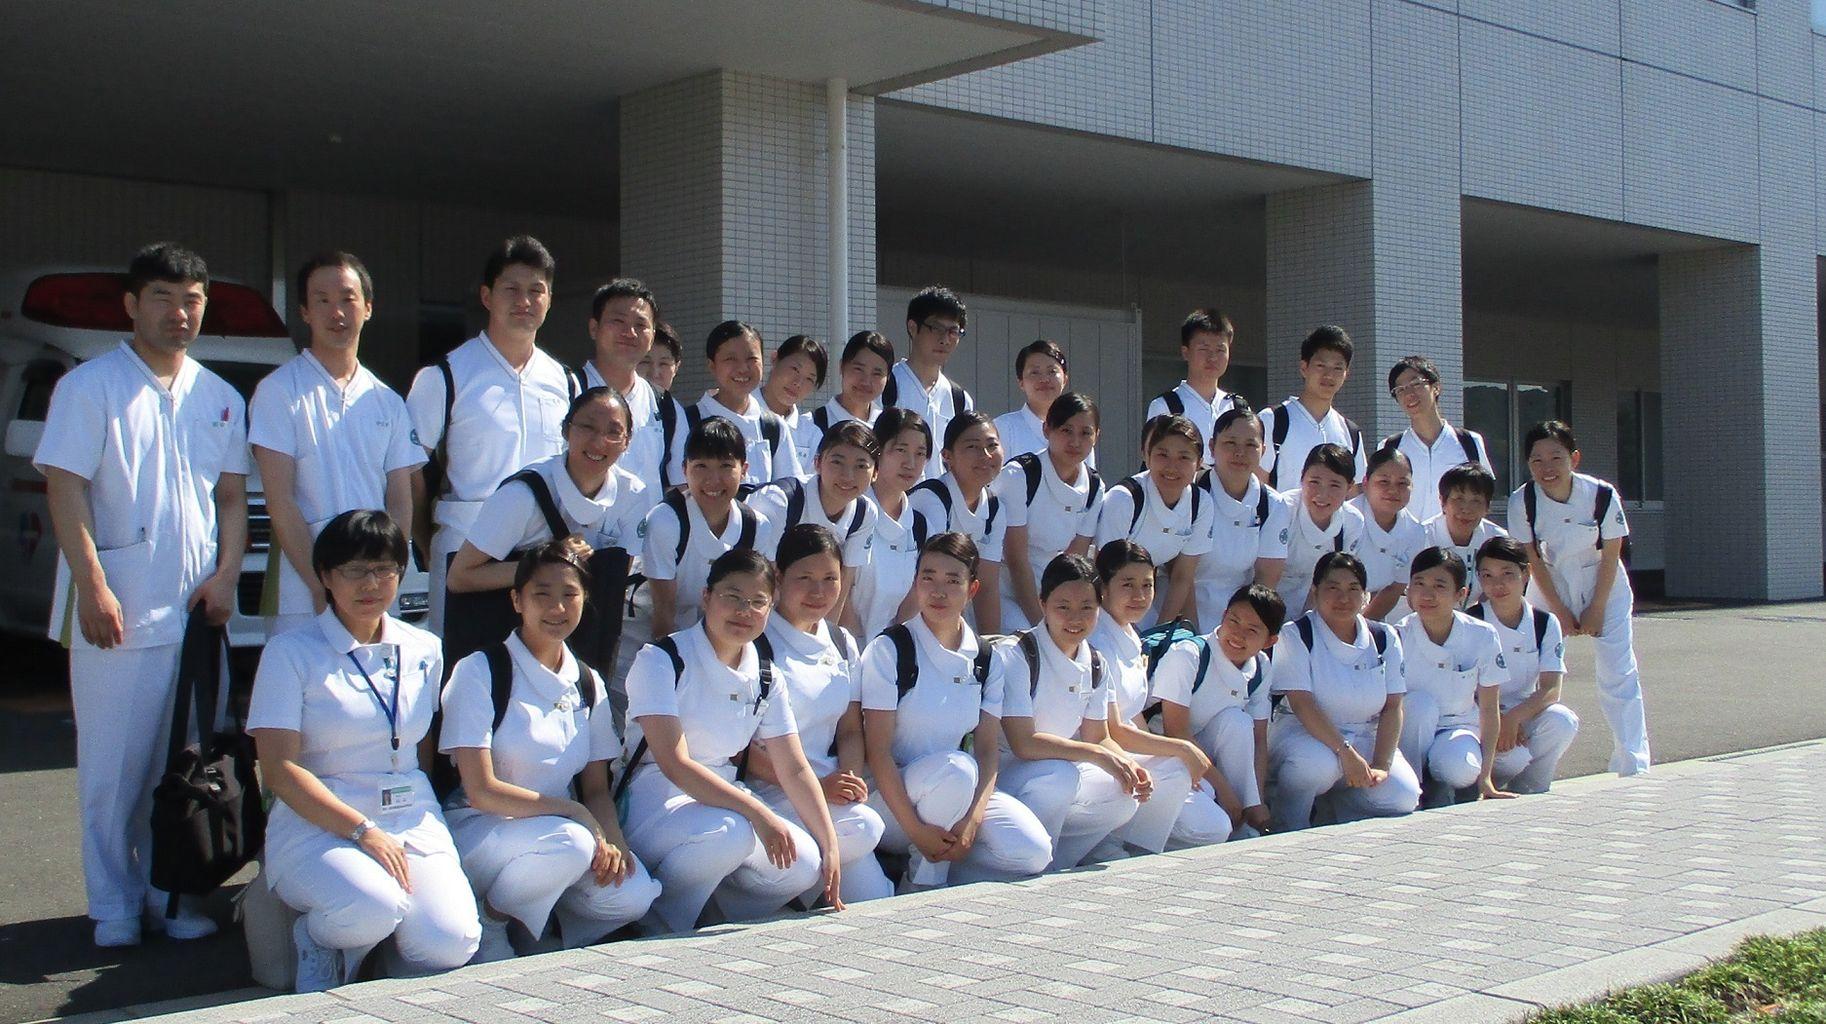 IMG_6795.JPG